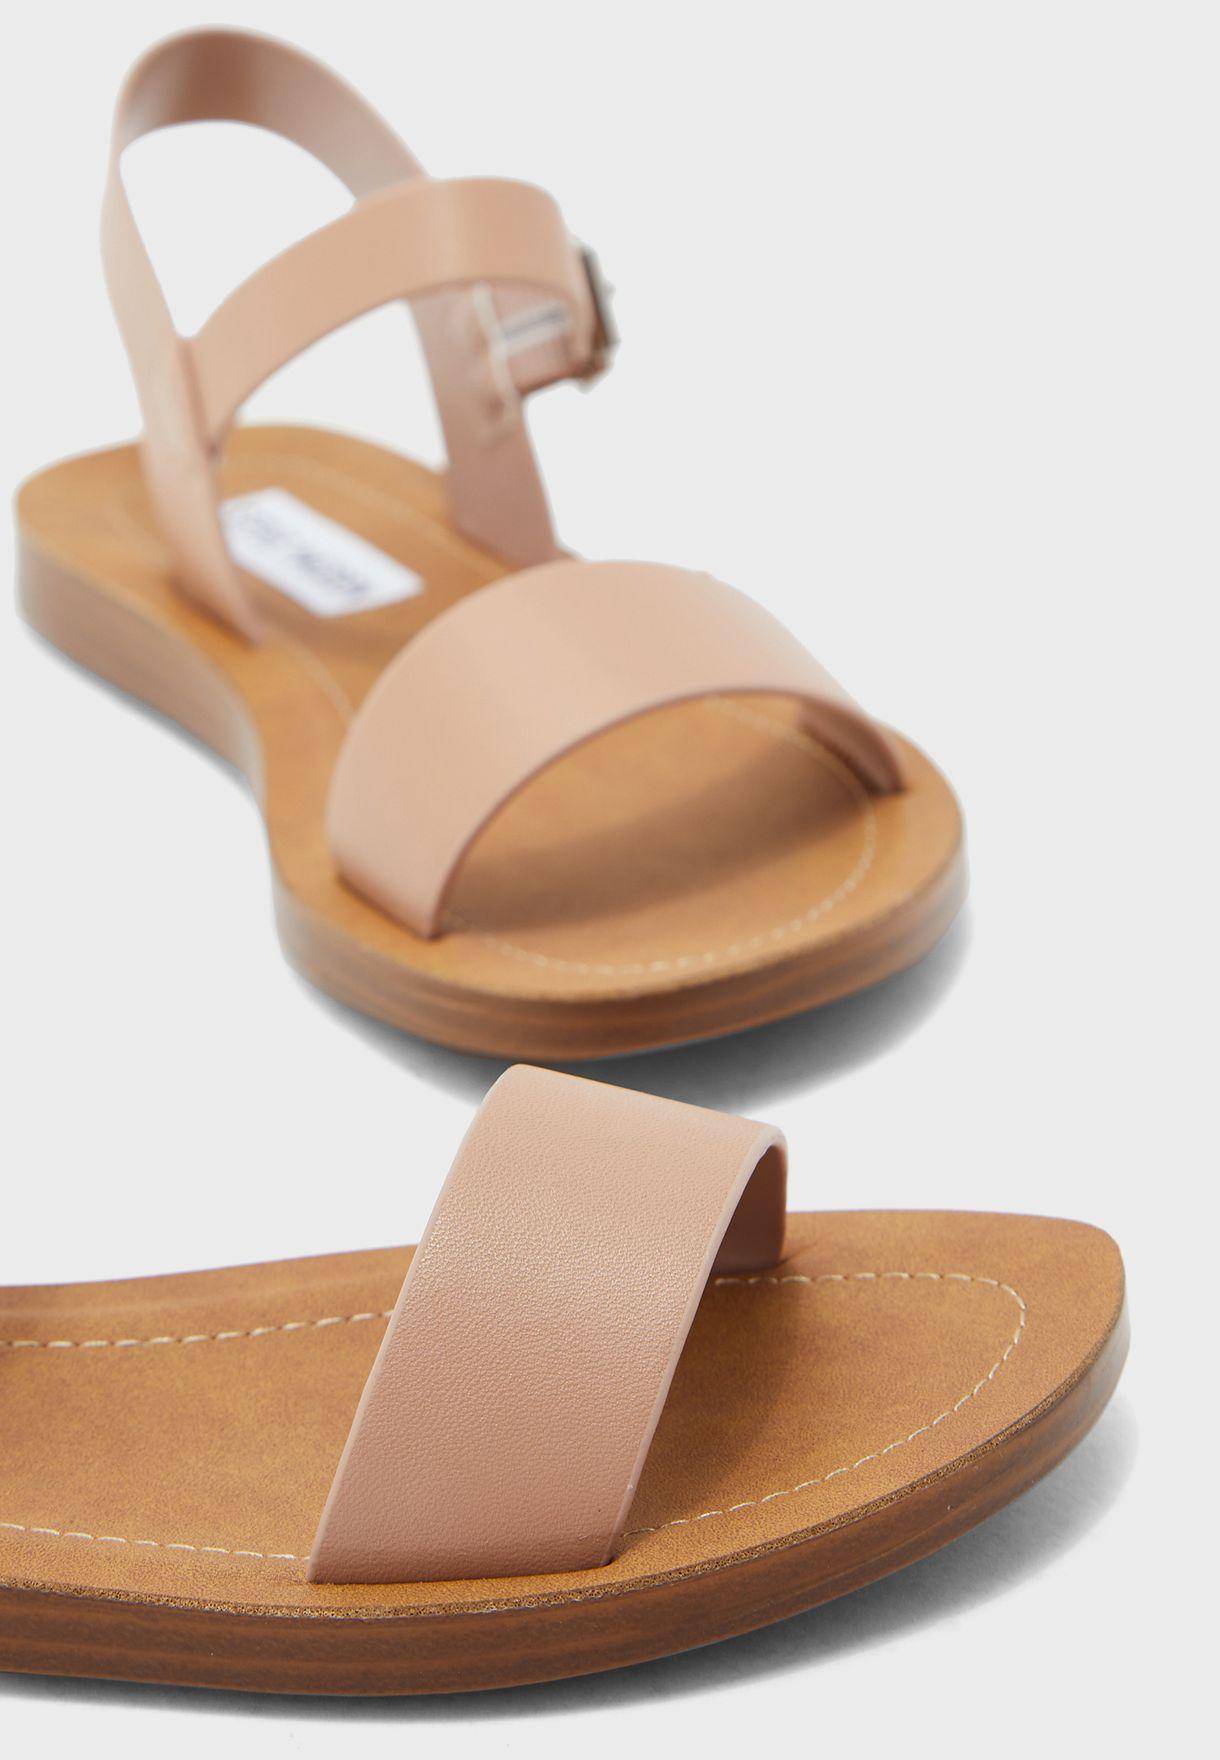 League Flat Sandal